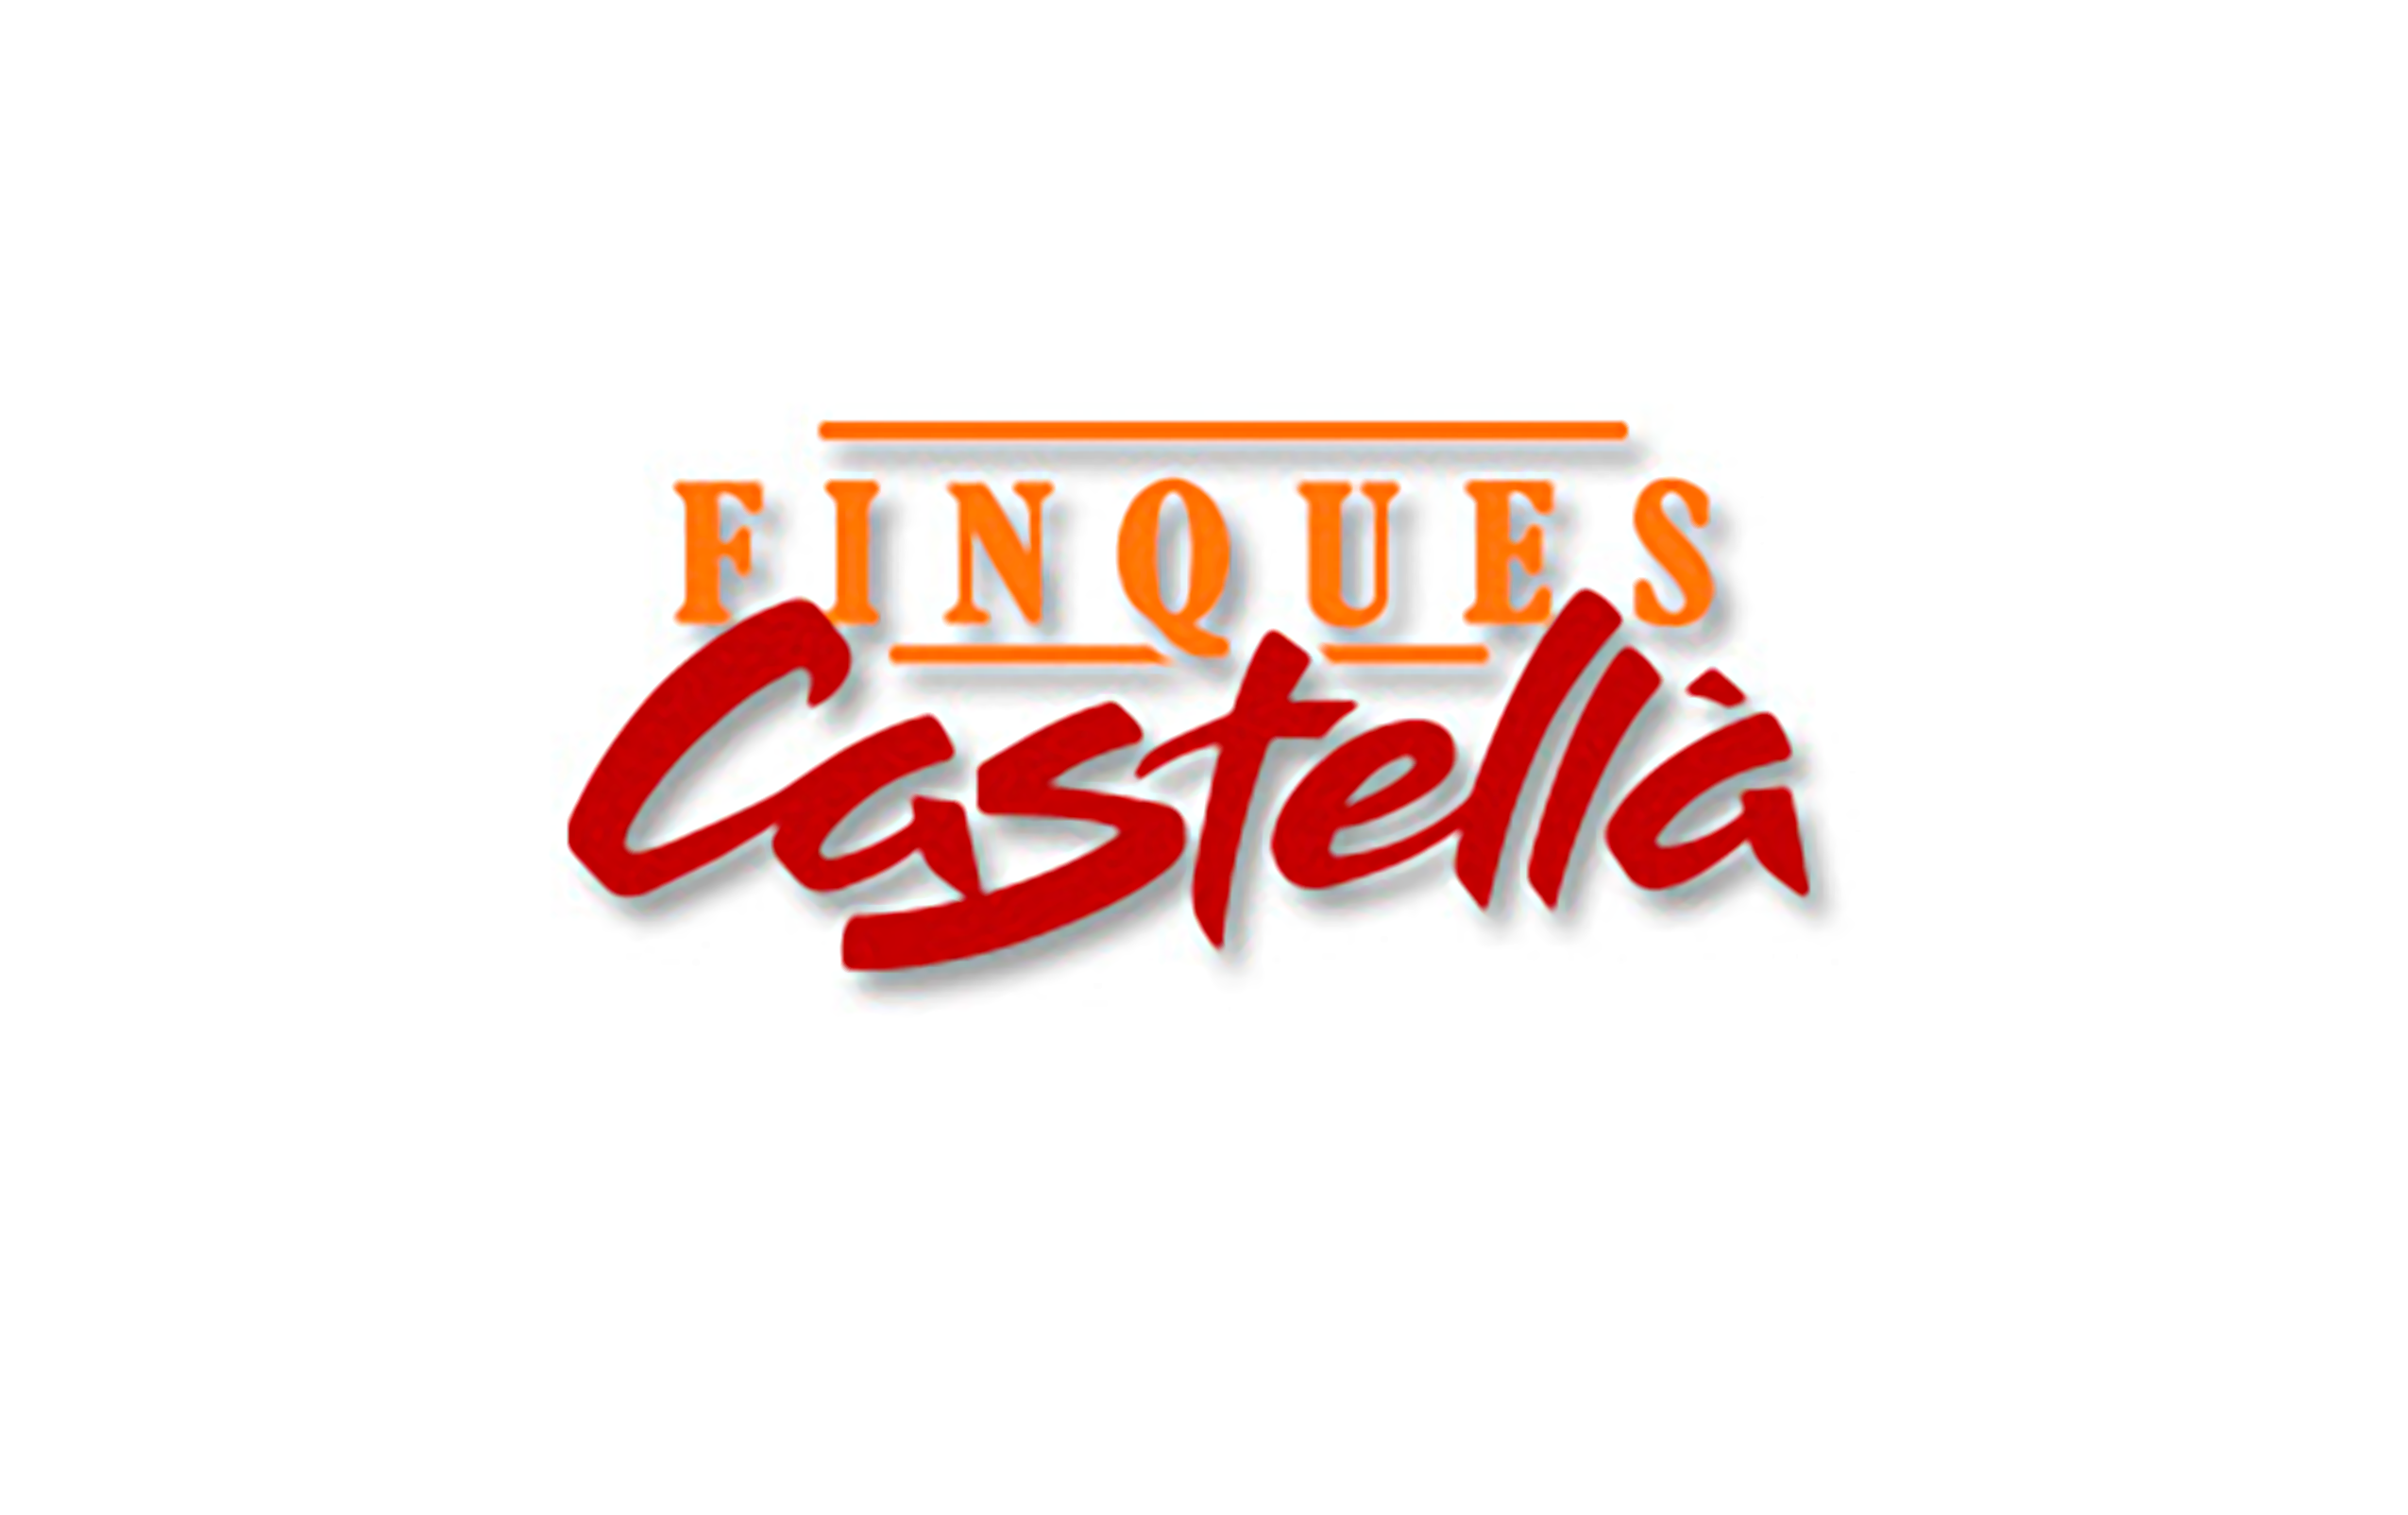 castella.png